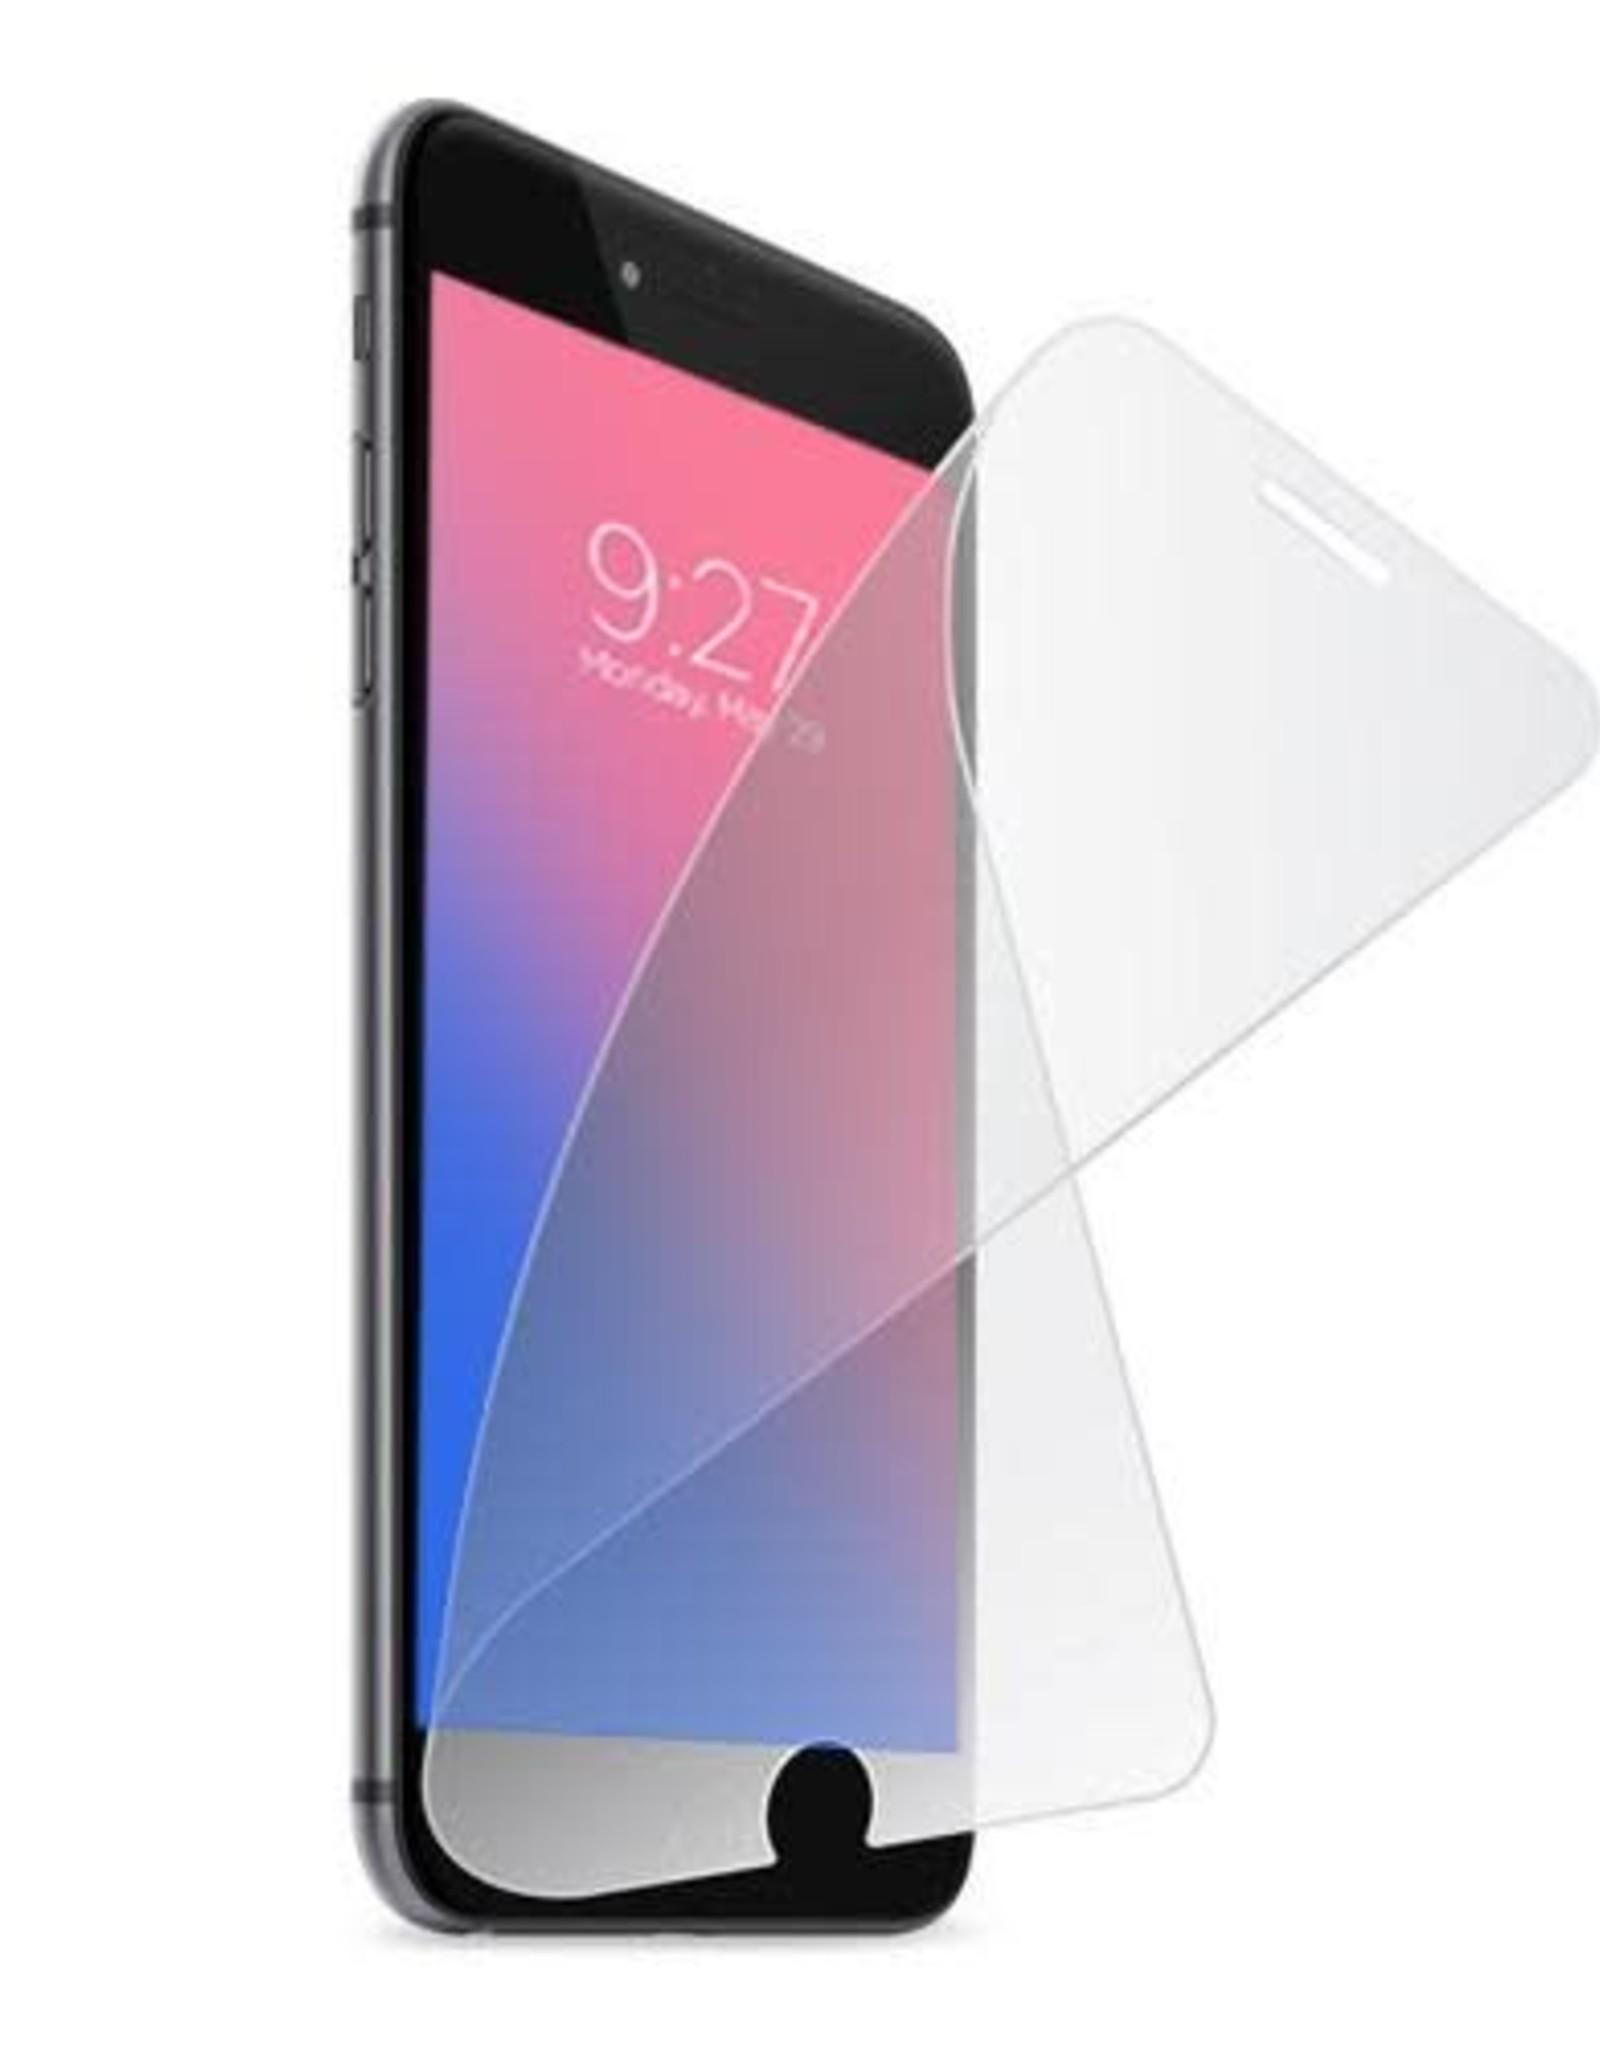 Caseco Caseco | iPhone 8/7/6/6s Screenflex - Flexible Screen Protector | WXCC-SFX-iP7